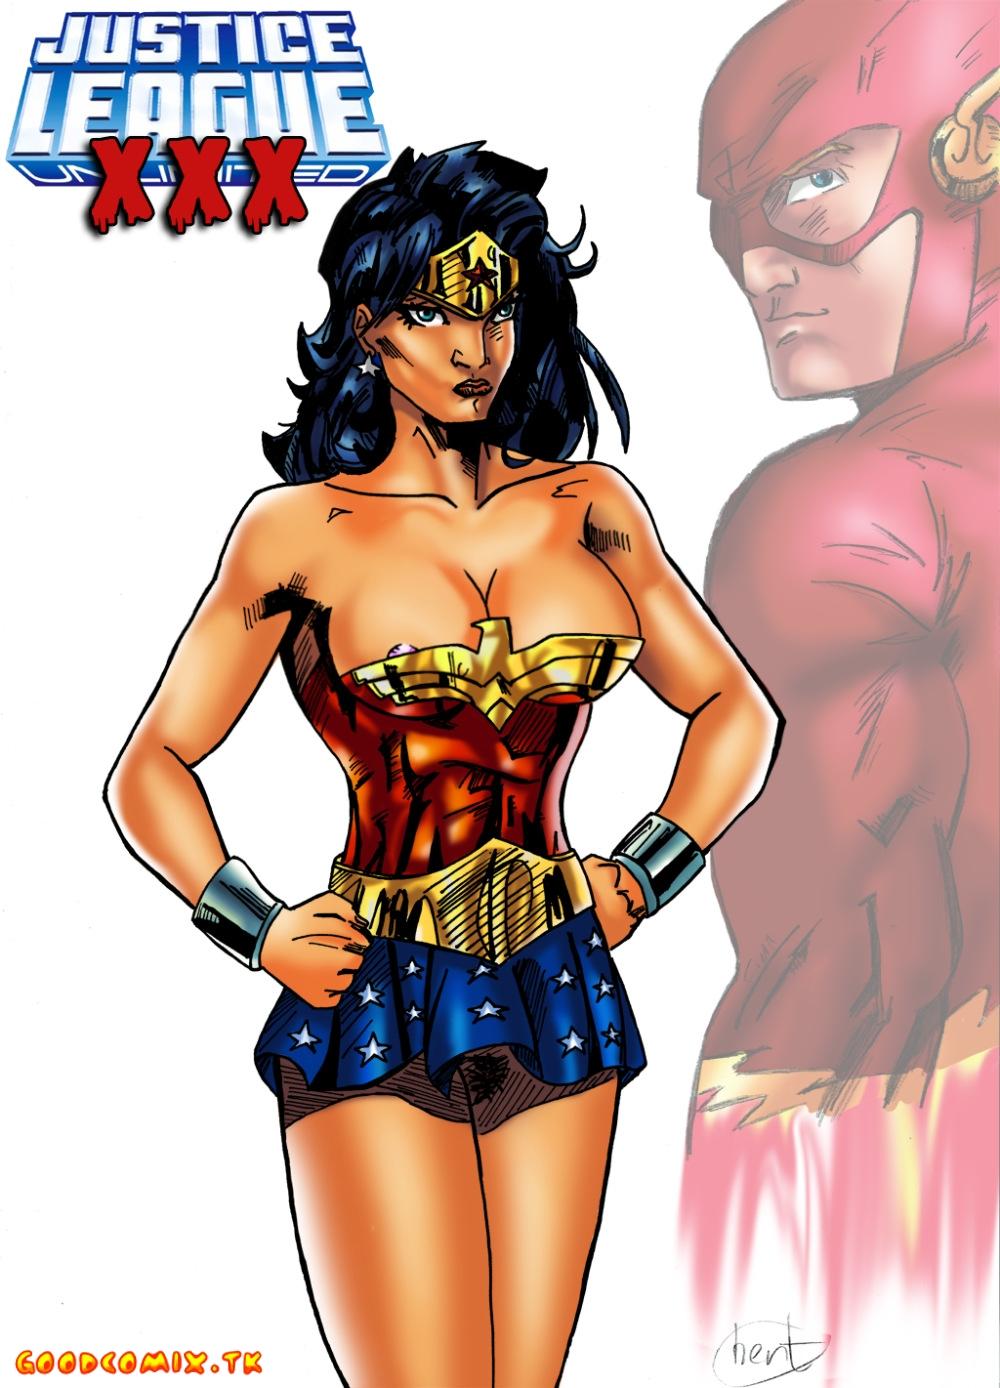 Goodcomix Justice League - [hent] - Justice Leage XXX